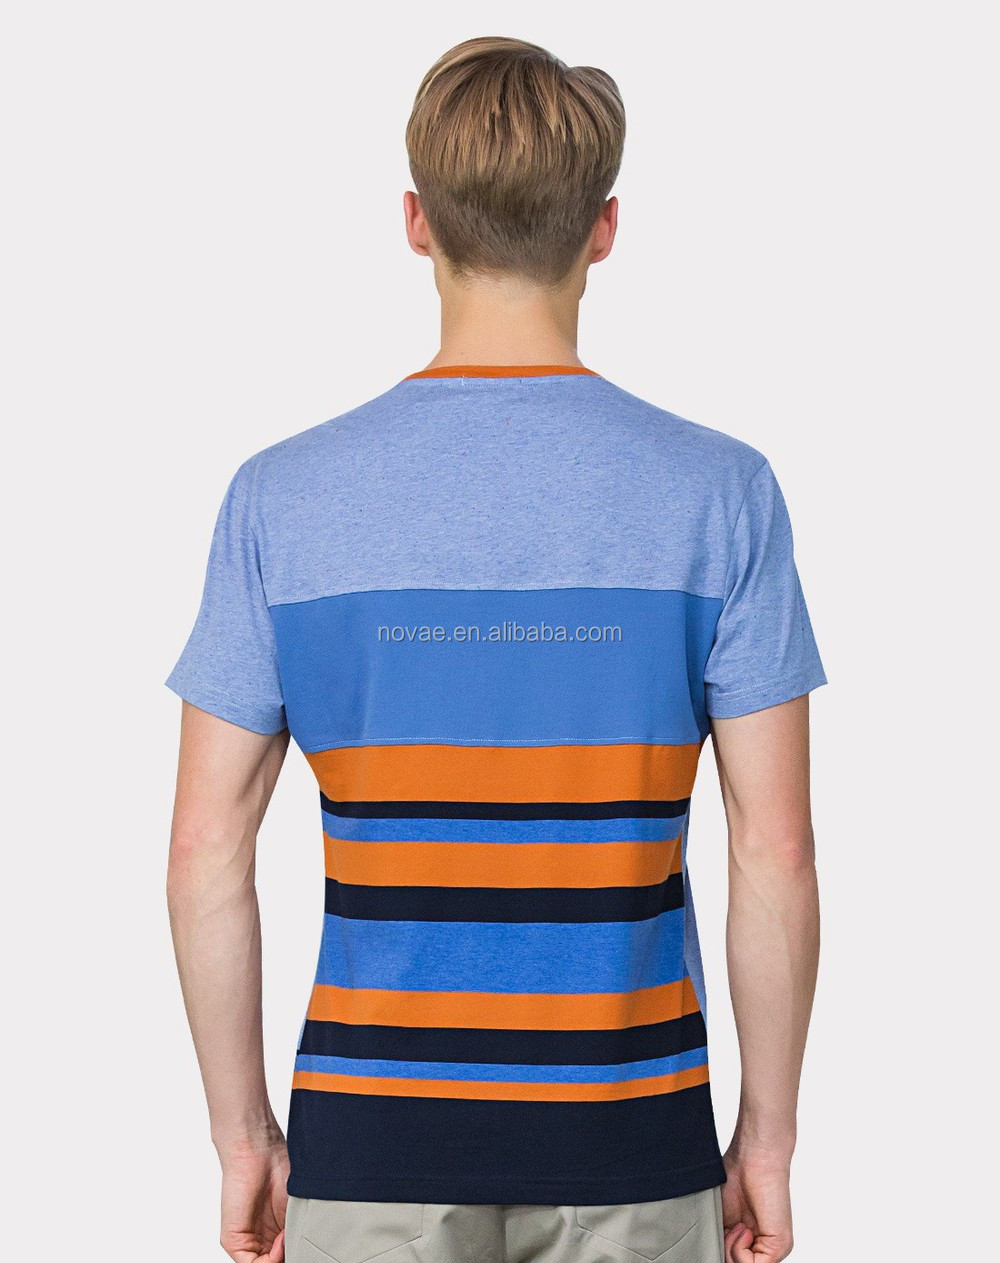 100 ring spun cotton t shirt blank pocket t shirt for 100 ringspun cotton t shirt wholesale